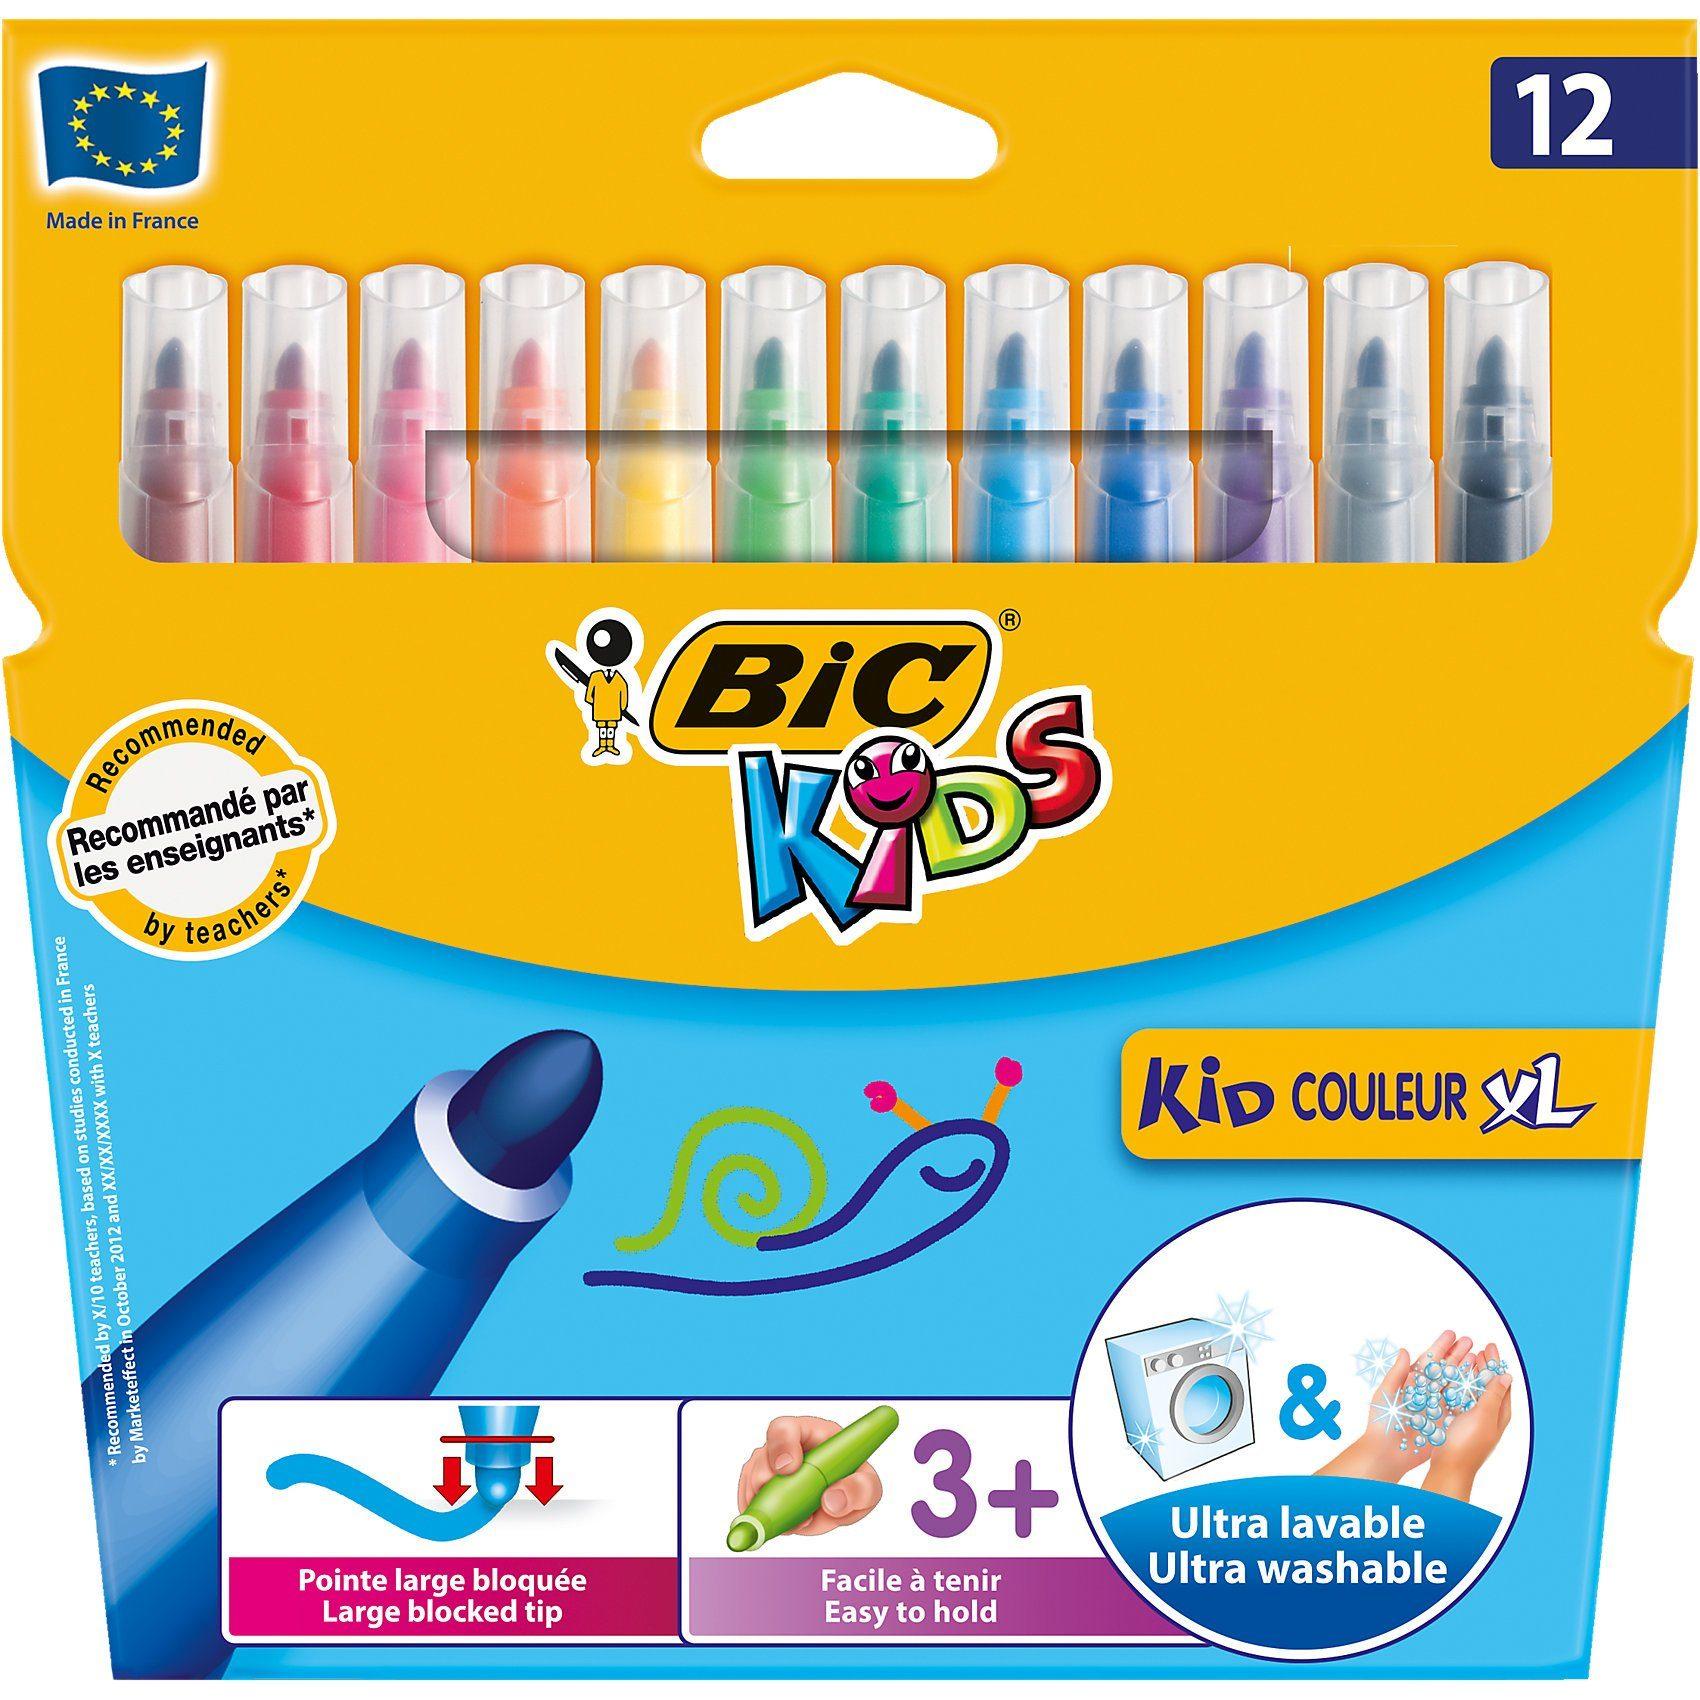 BIC Kids Kid Couleur XL Filzstifte, 12 Farben